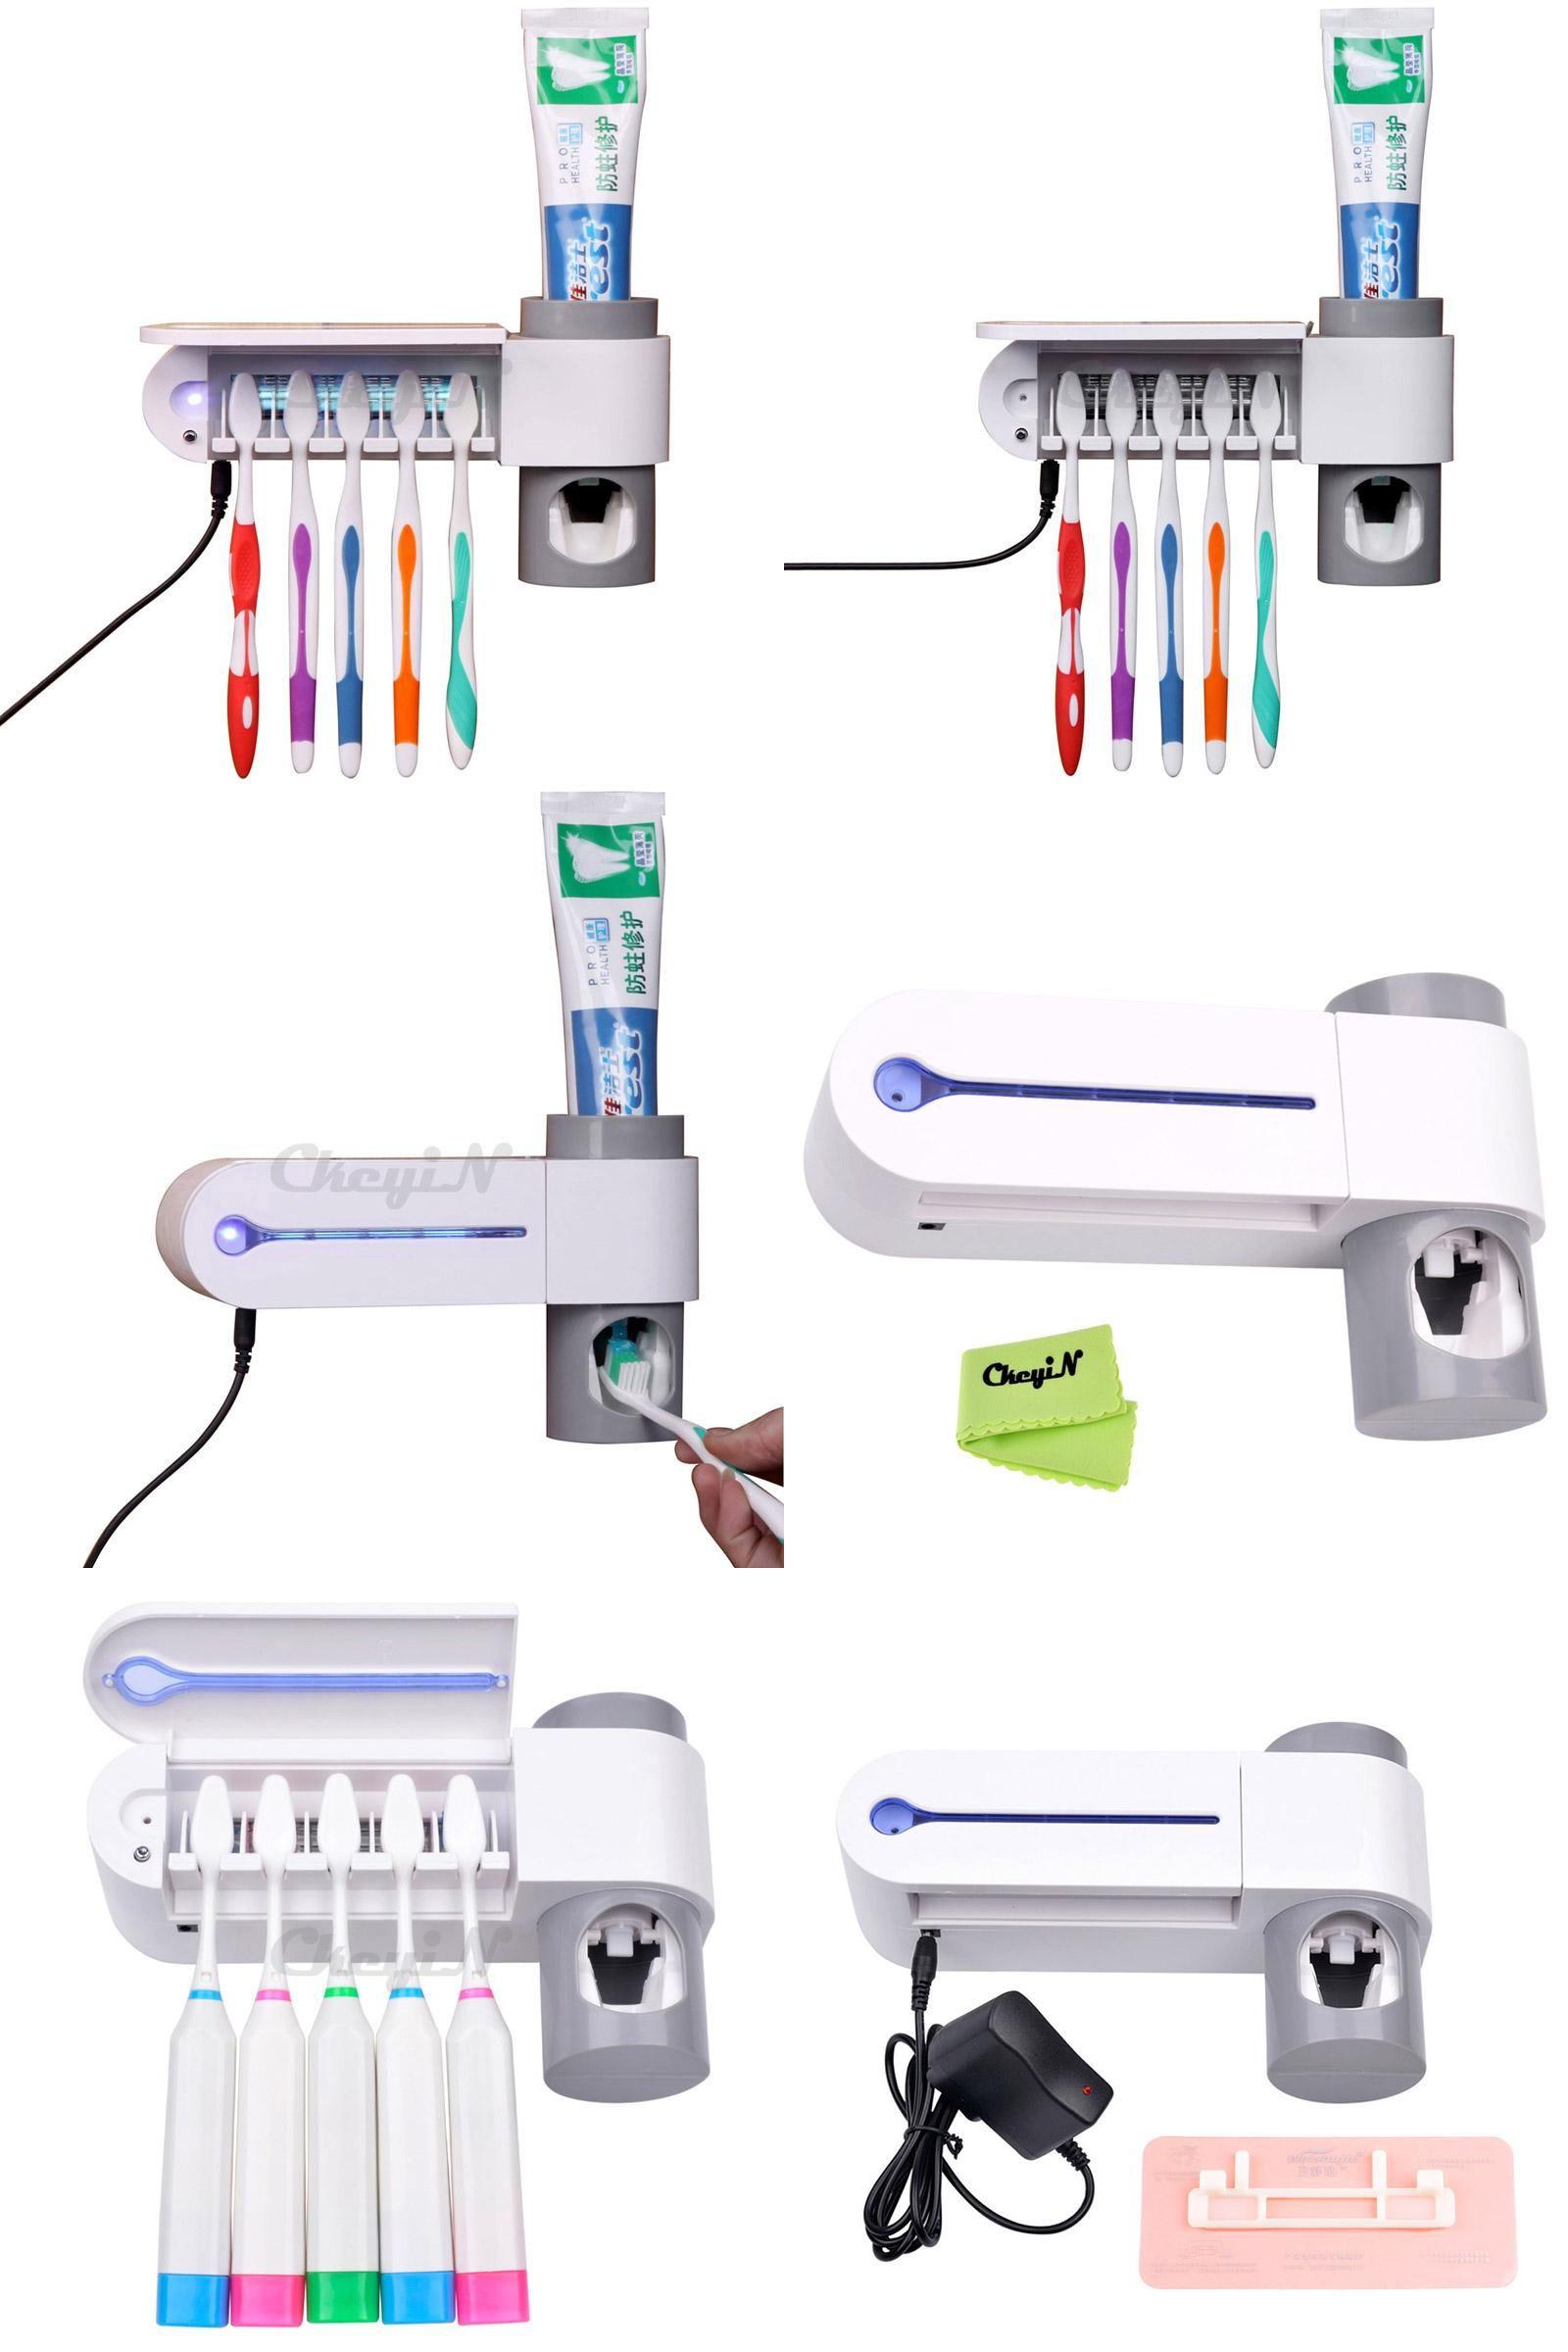 UV Light Sterilizer AntiBacteria Toothbrush Holder